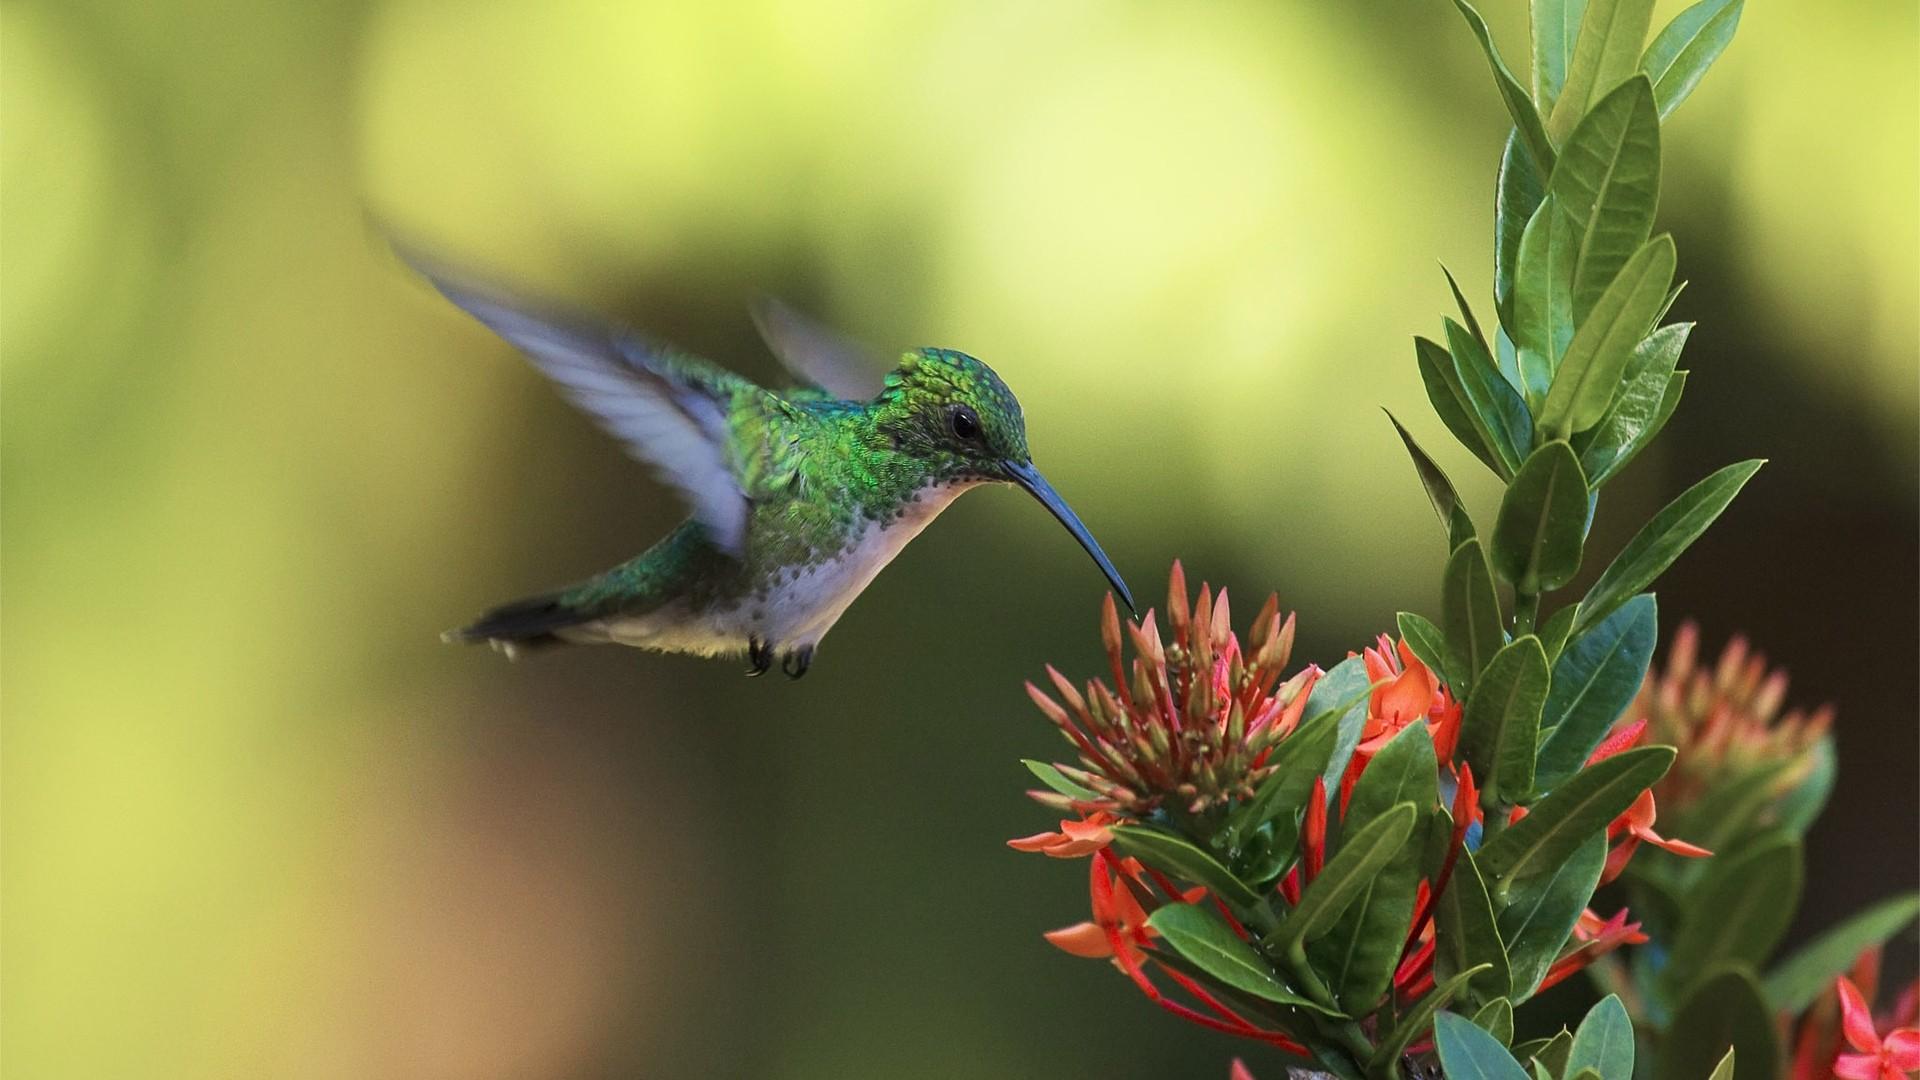 Hummingbird wallpaper photo hd